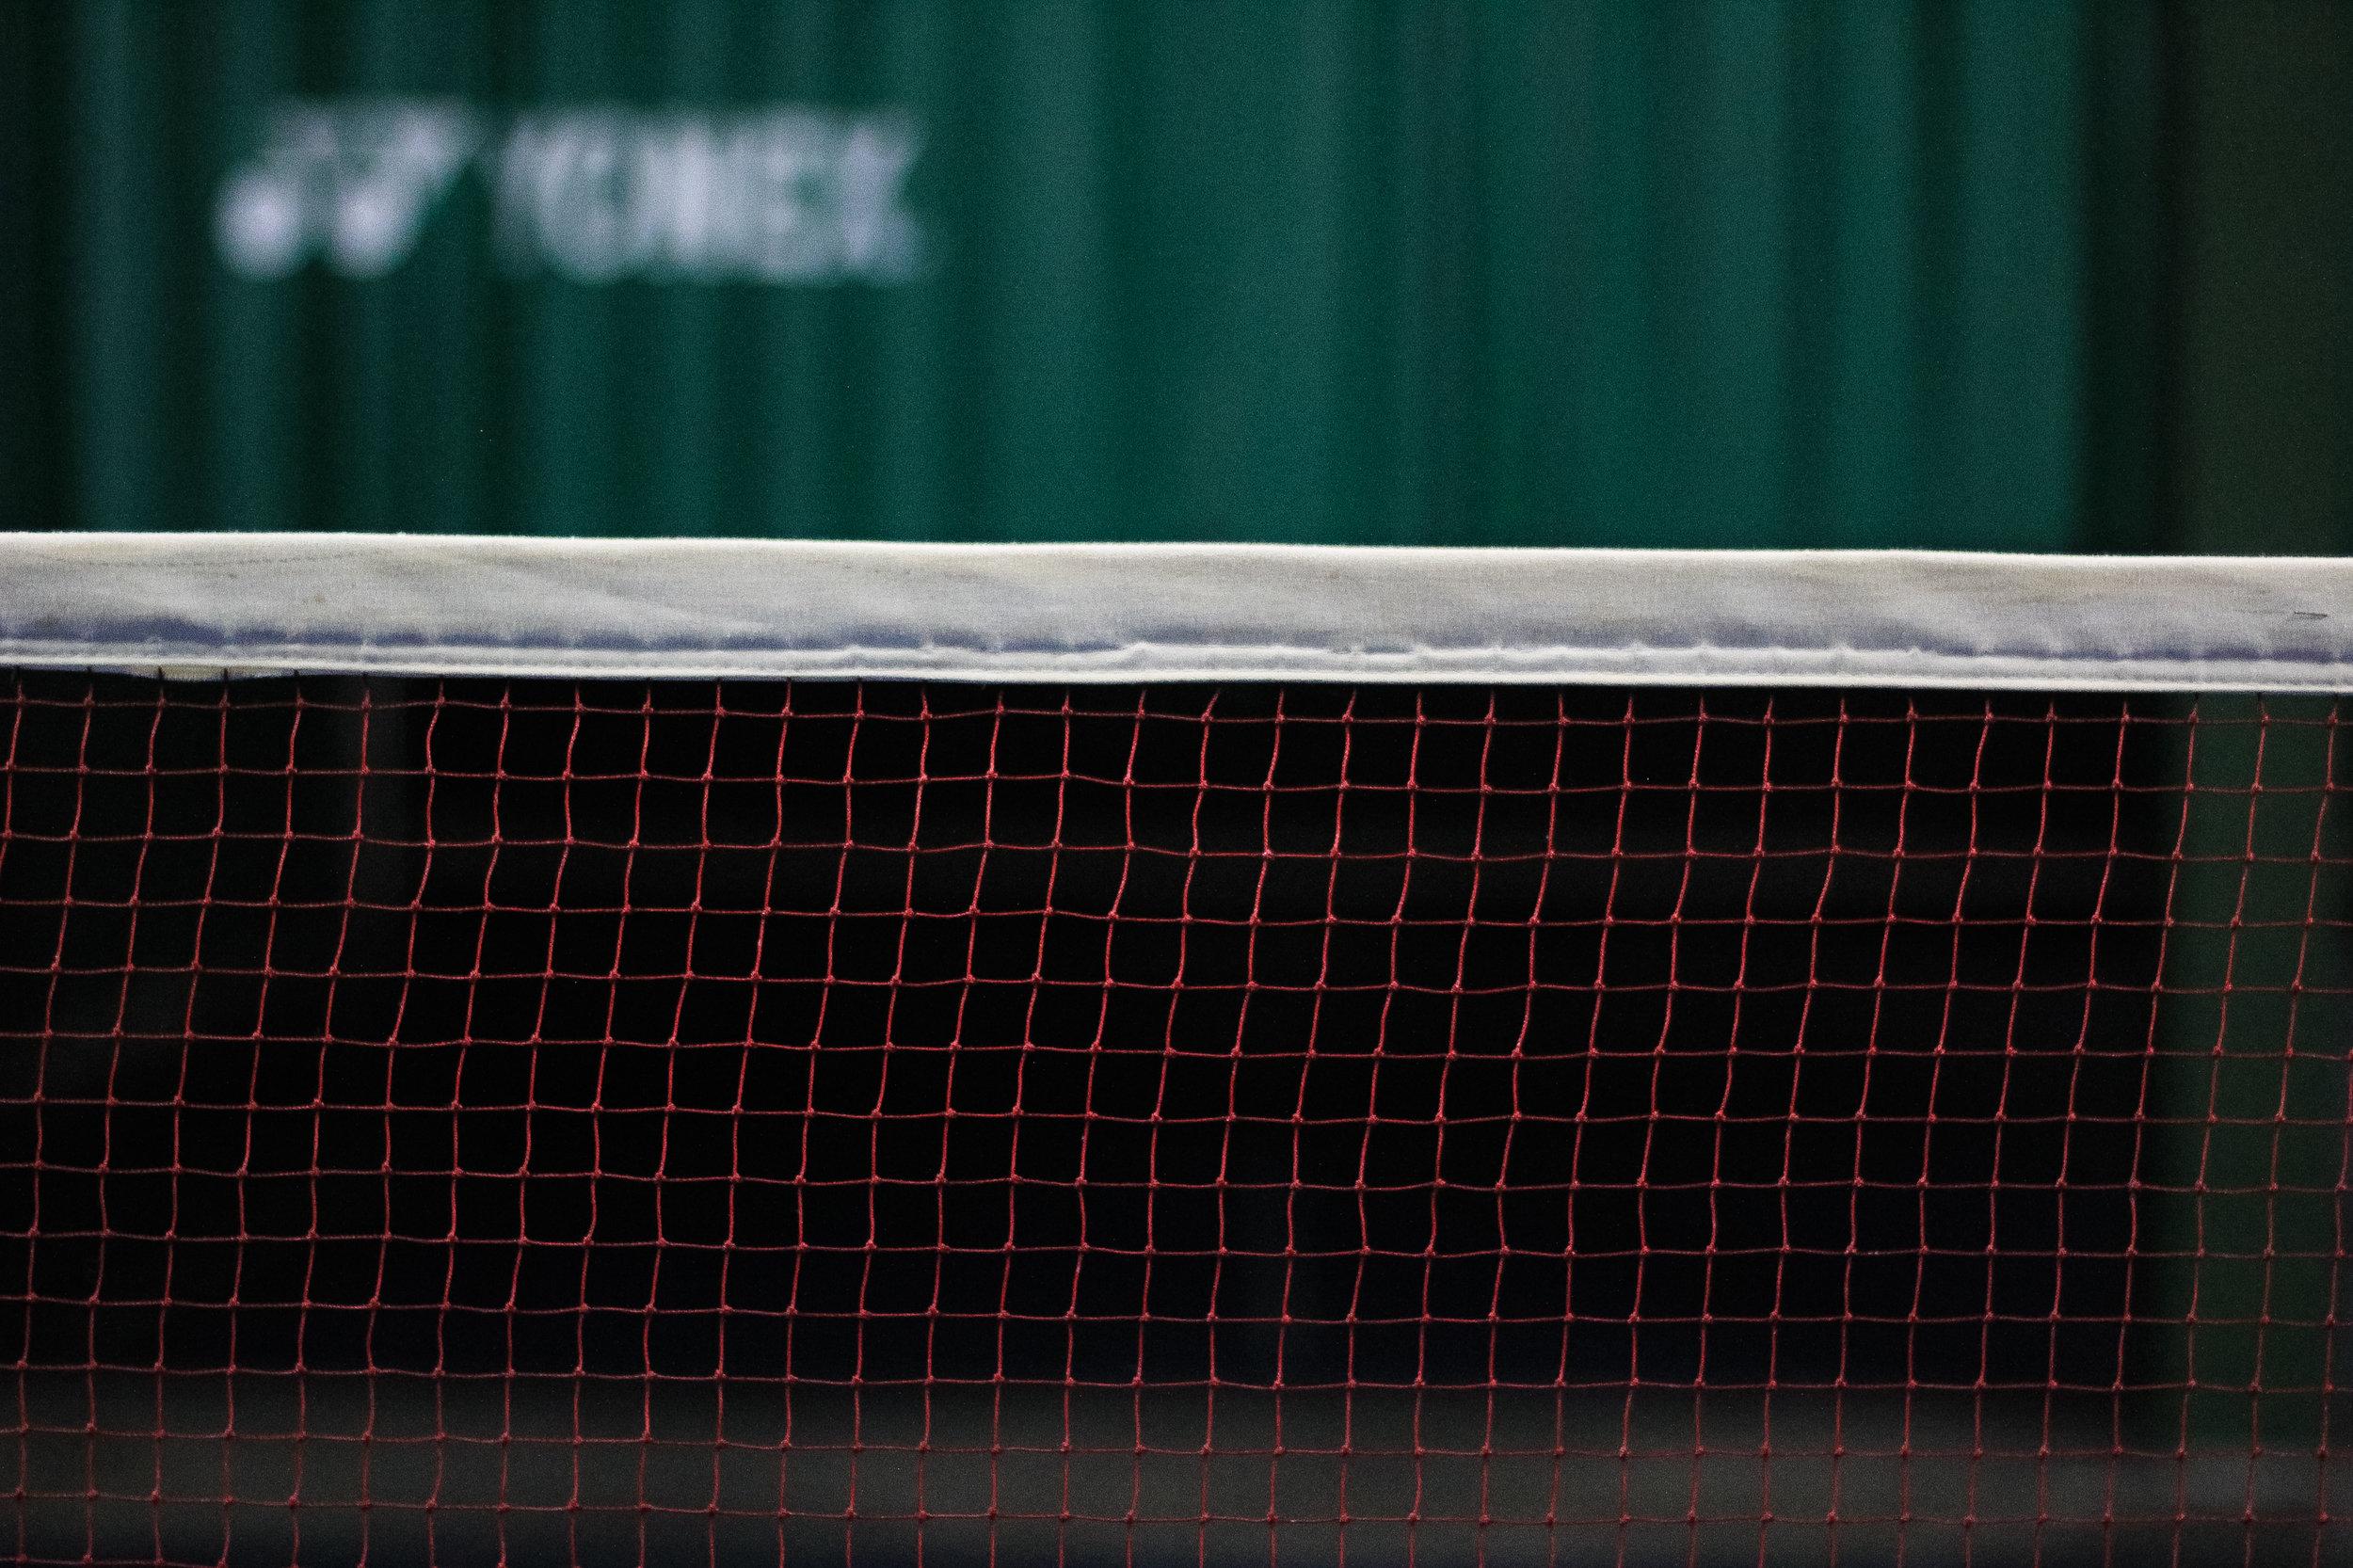 The Hawks - Mixed Badminton